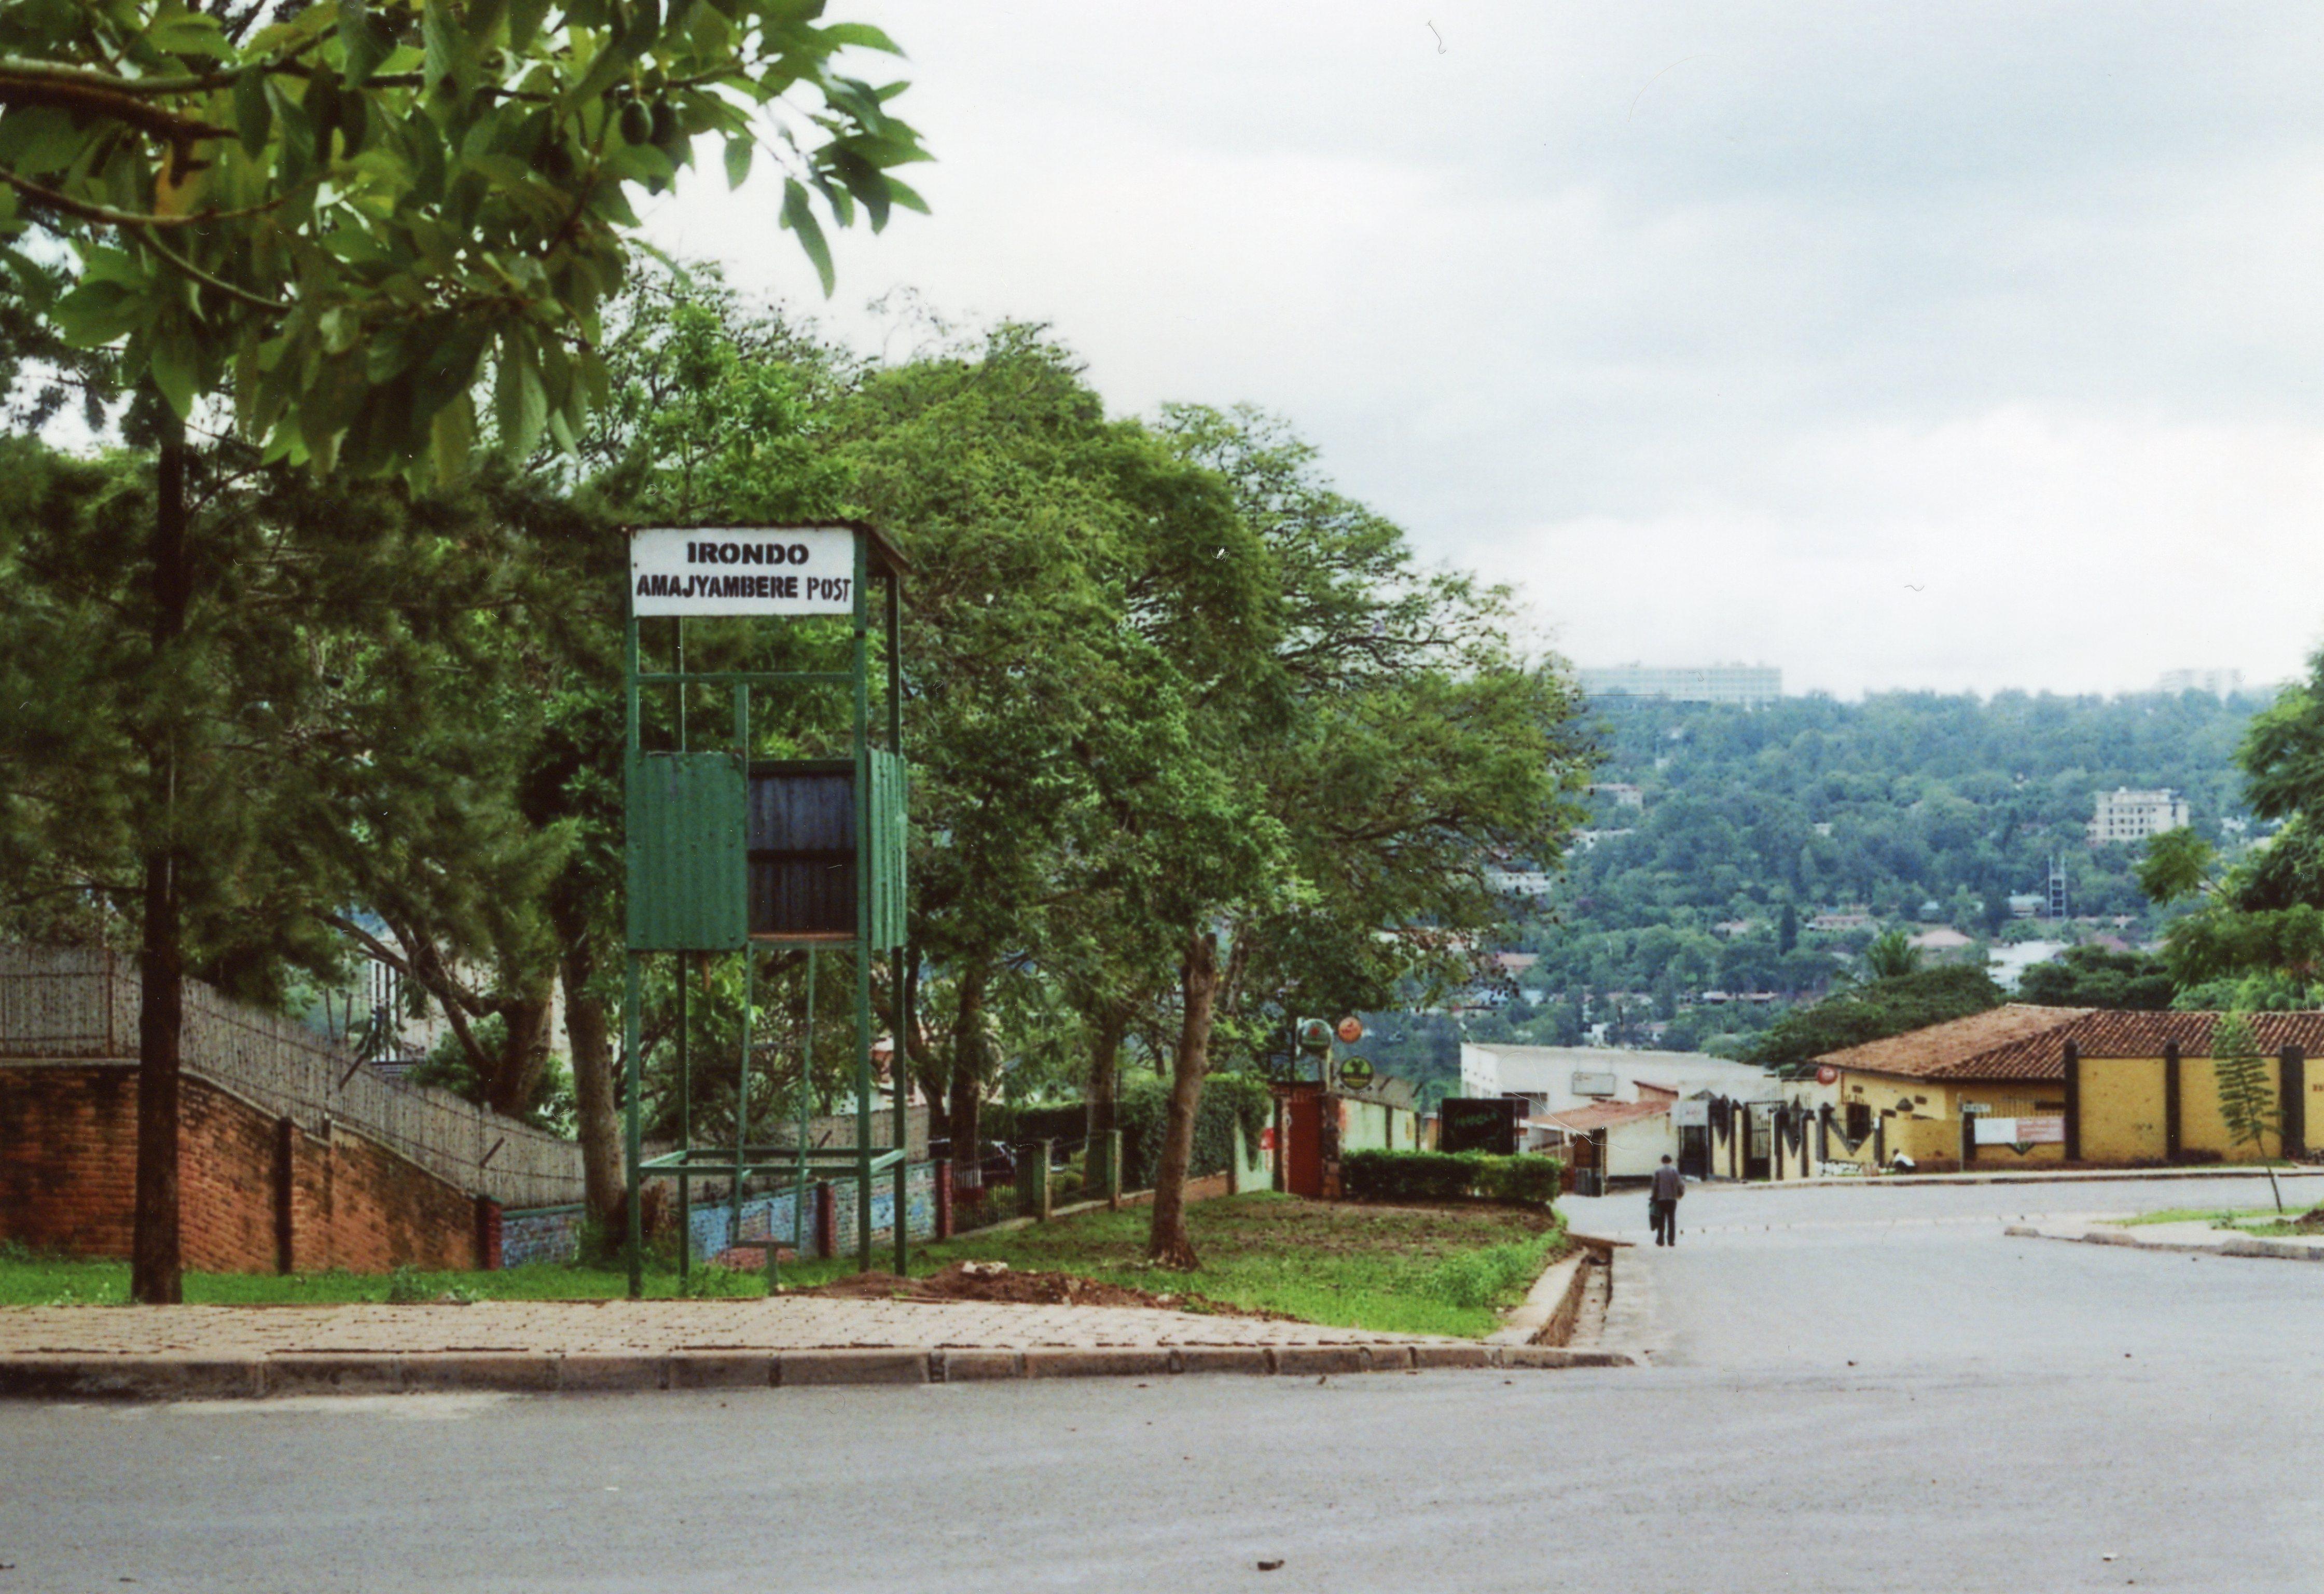 Military check point in the street, Kimihurura Neighborhood, Kigali, 2017.